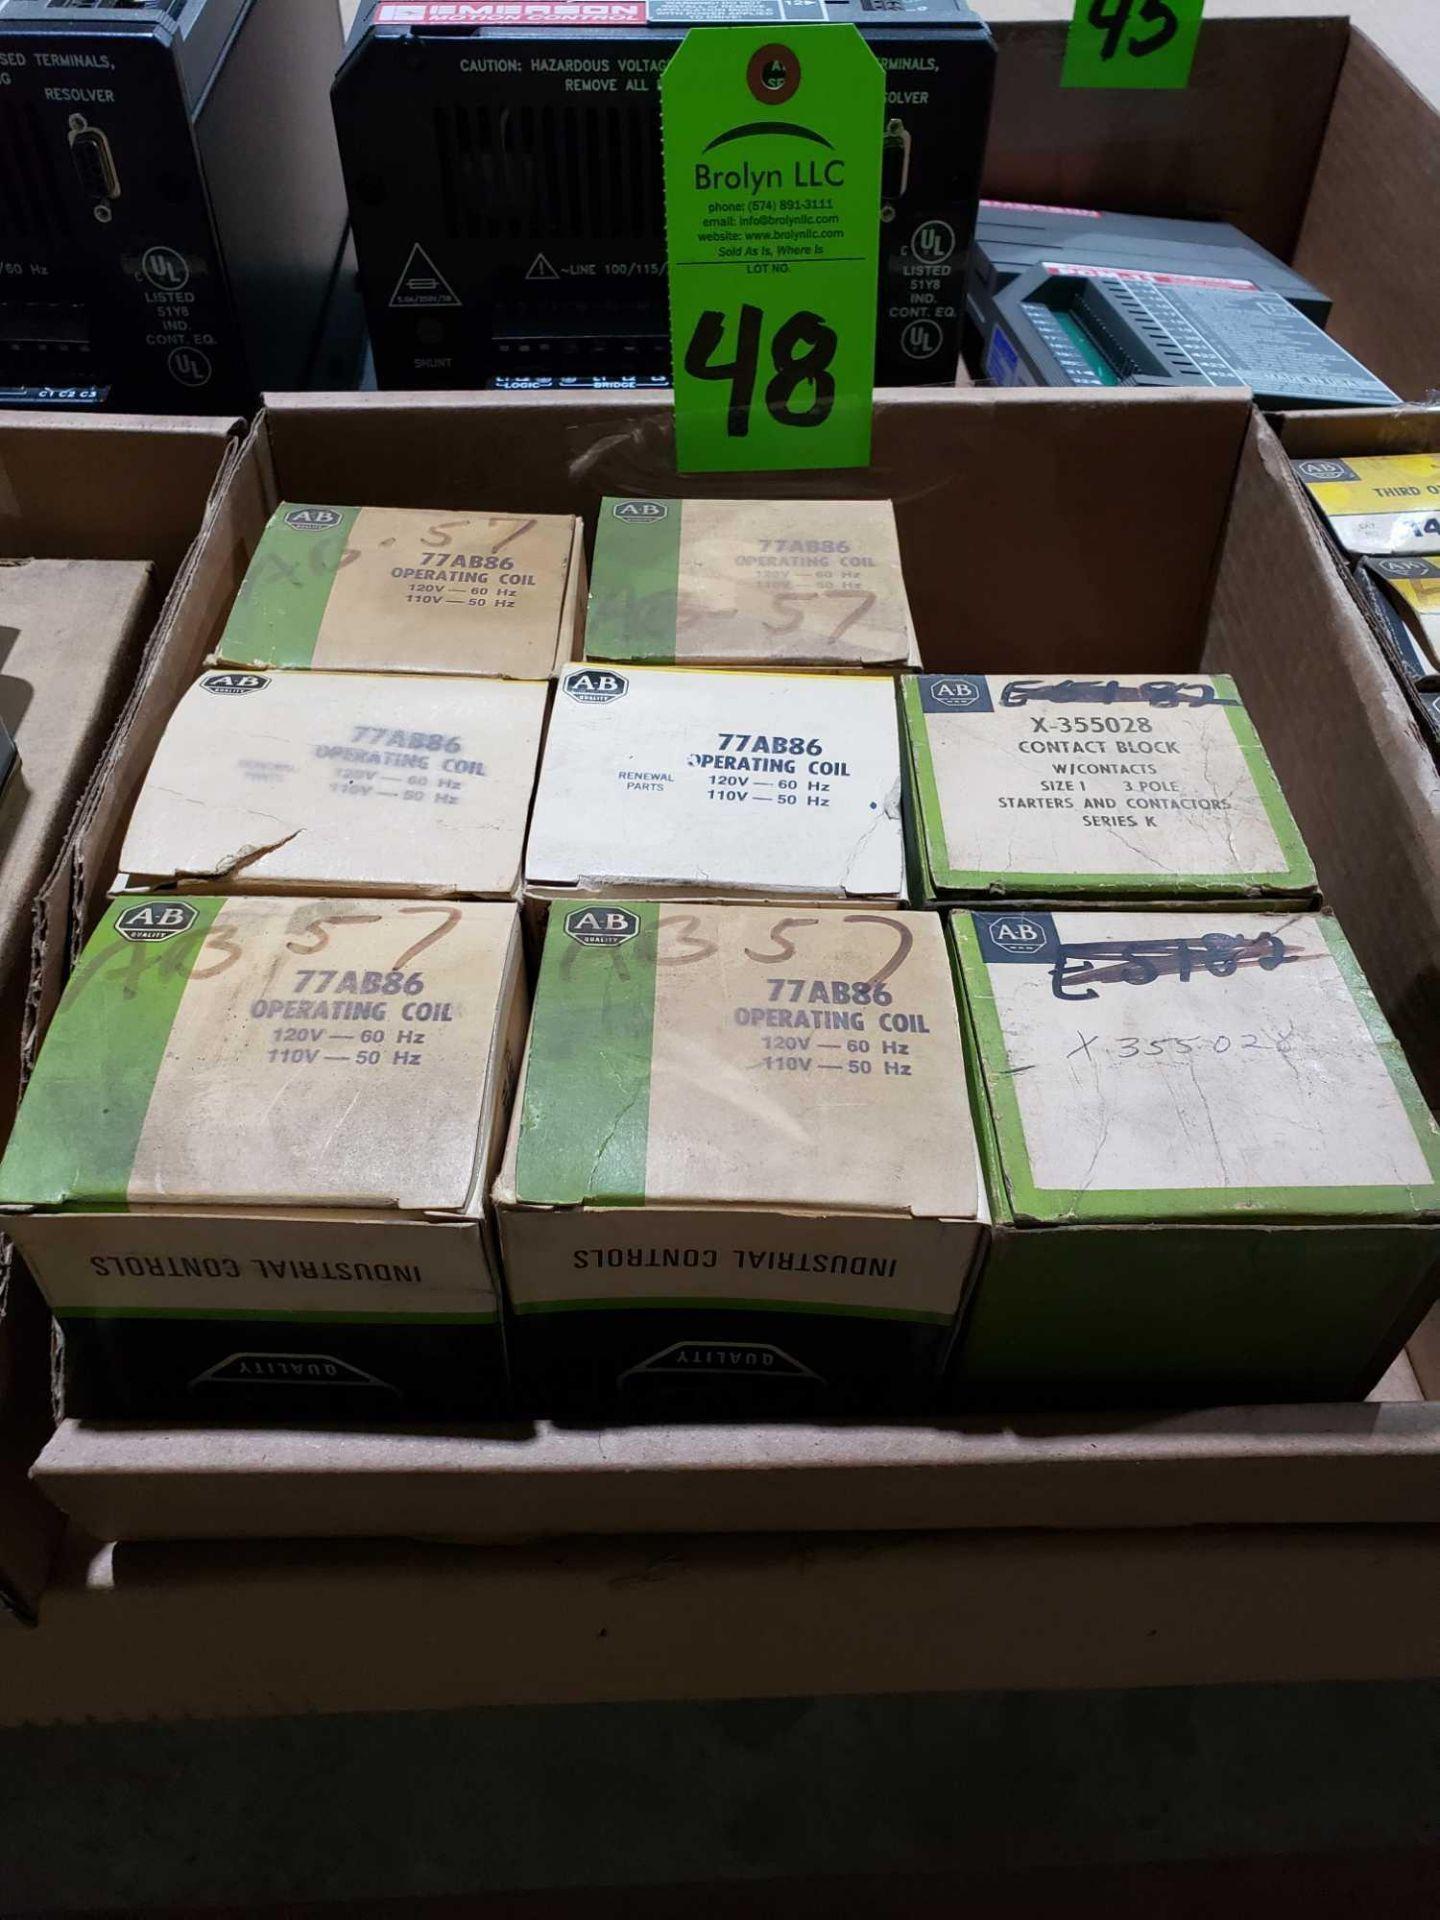 Lot 48 - Qty 8 - Allen Bradley model 77AB86. New in boxes.